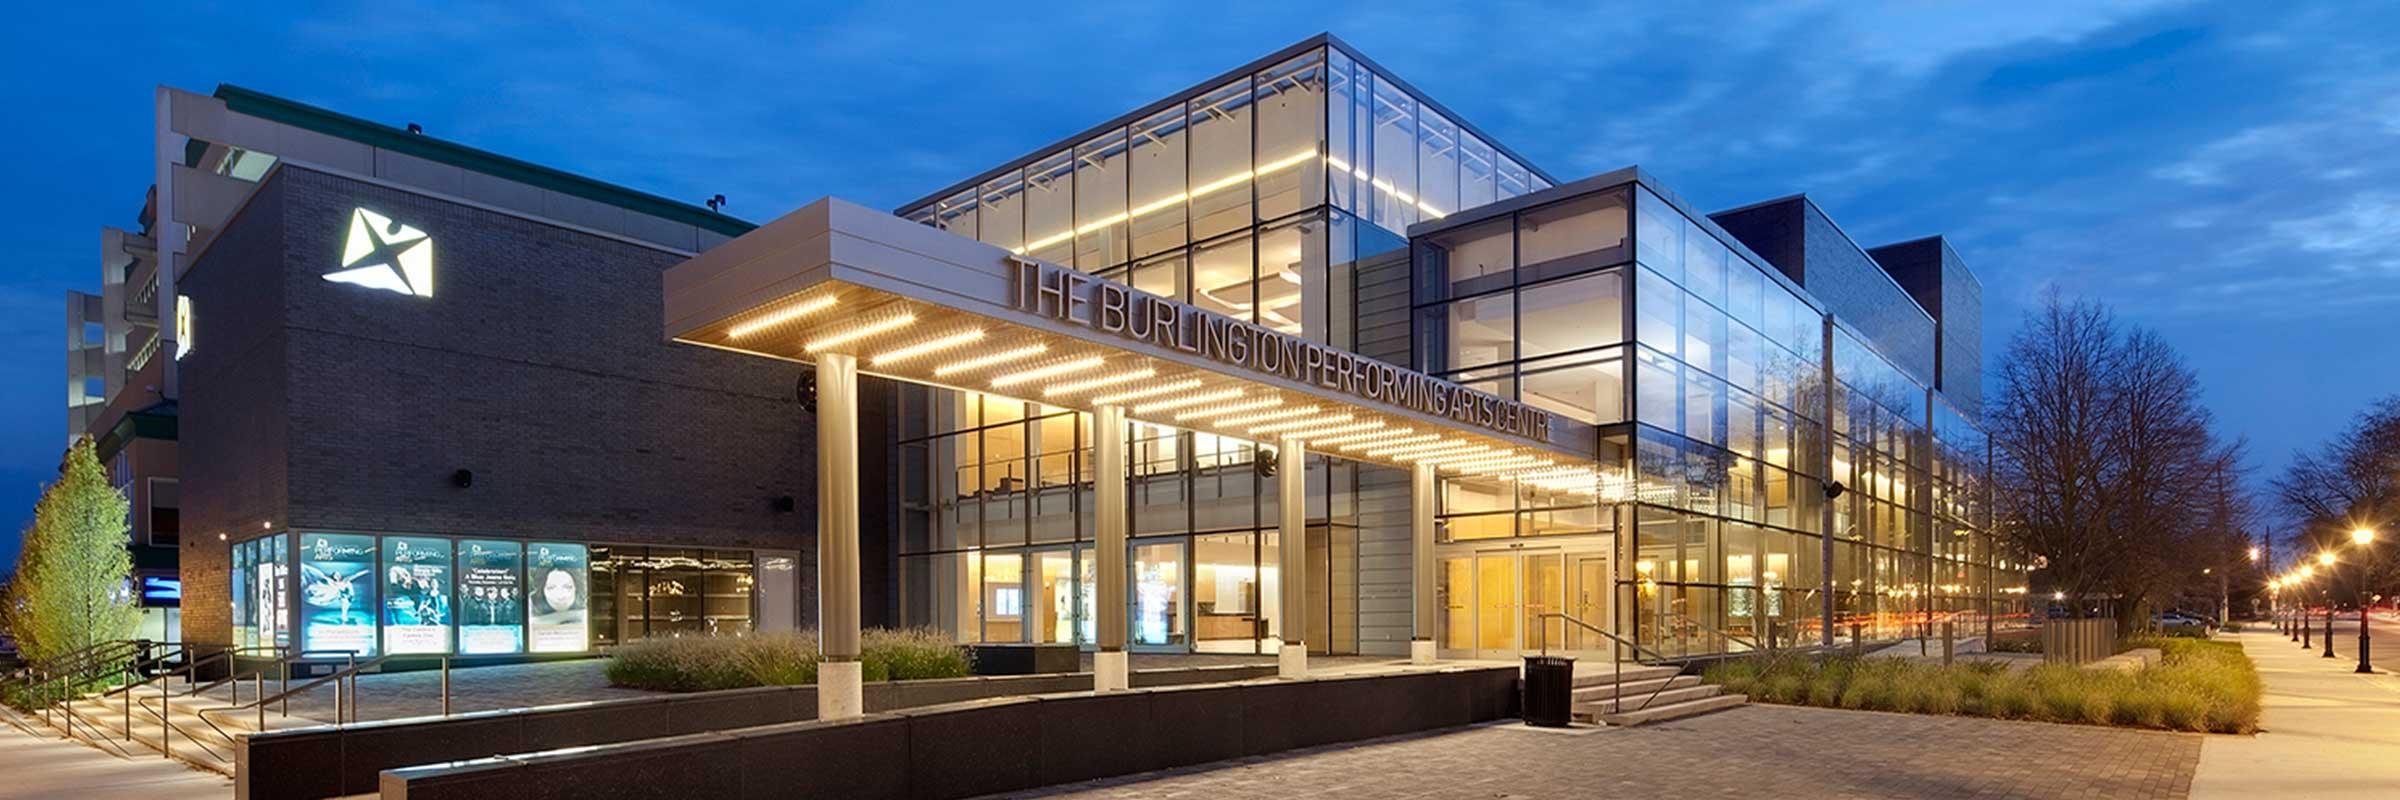 Burlington Performing Arts Centre at night